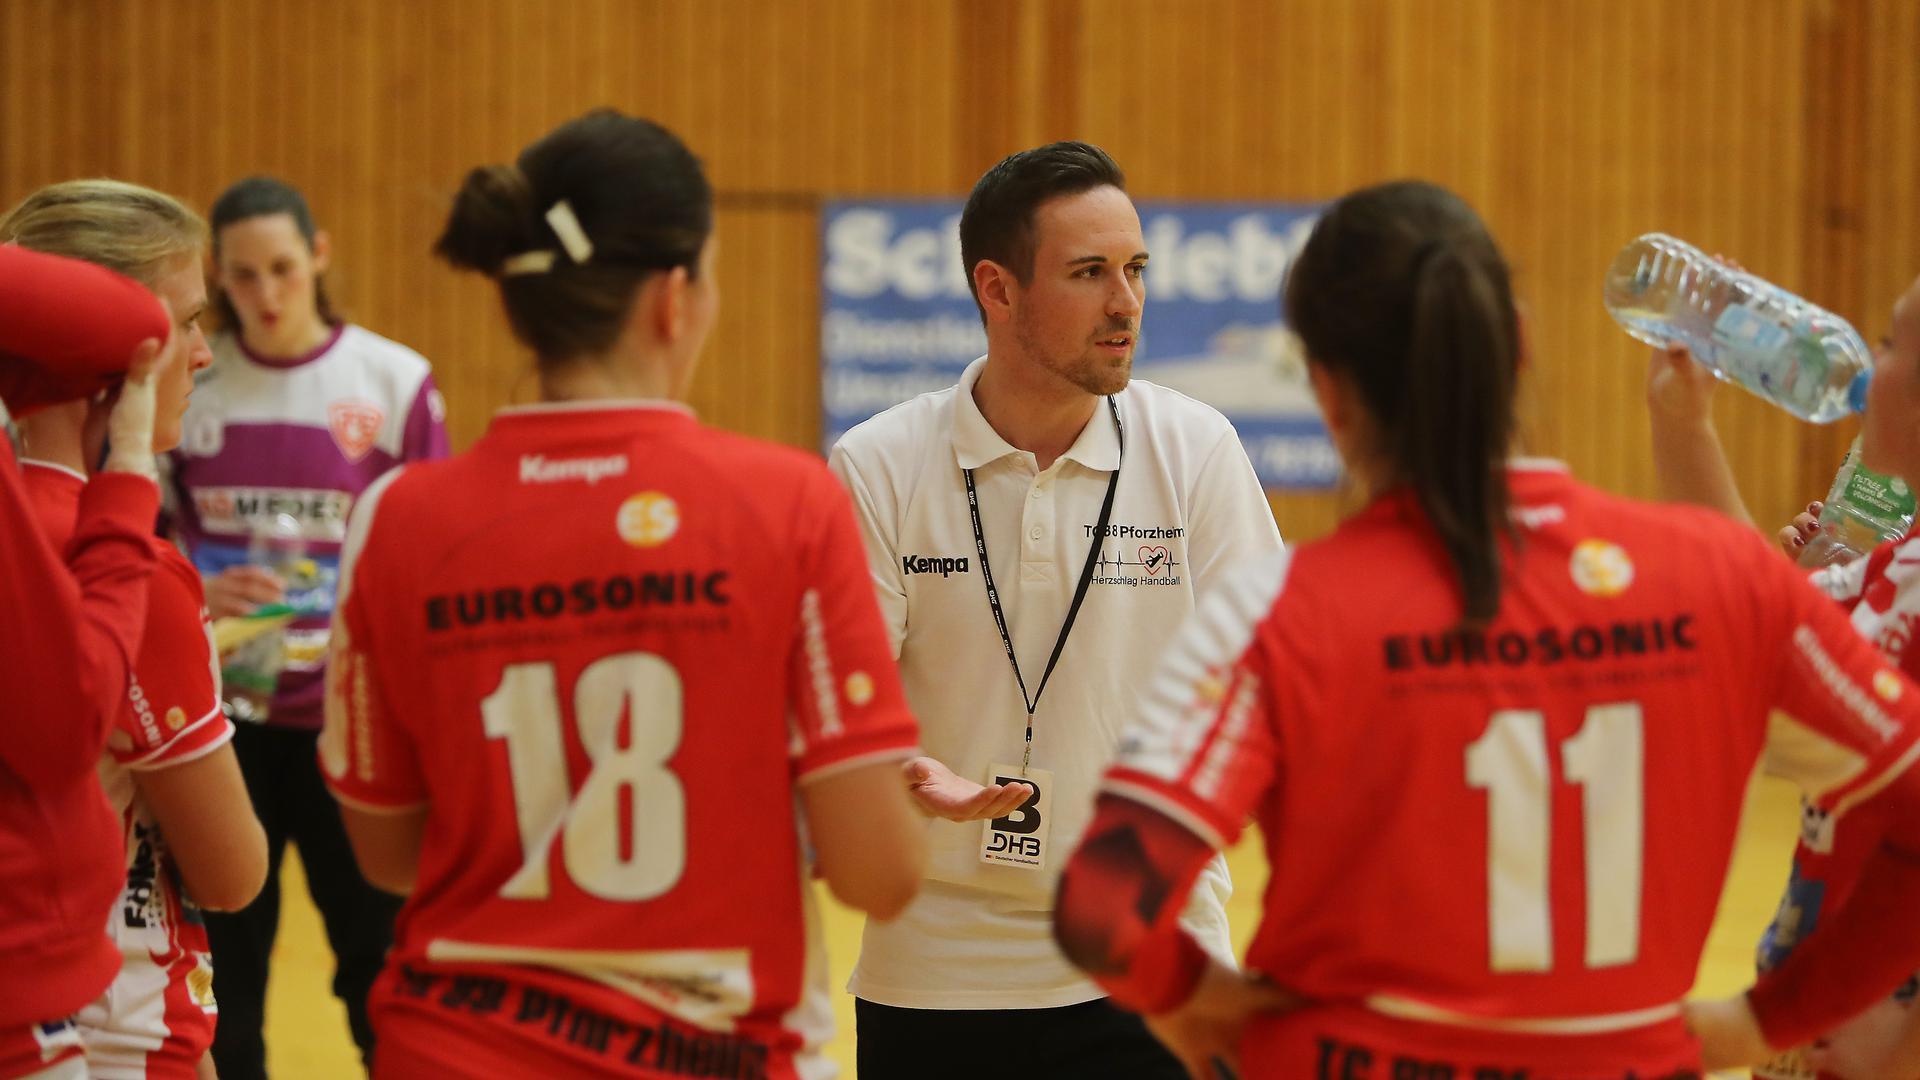 Rupf Henning Trainer Team TG 88